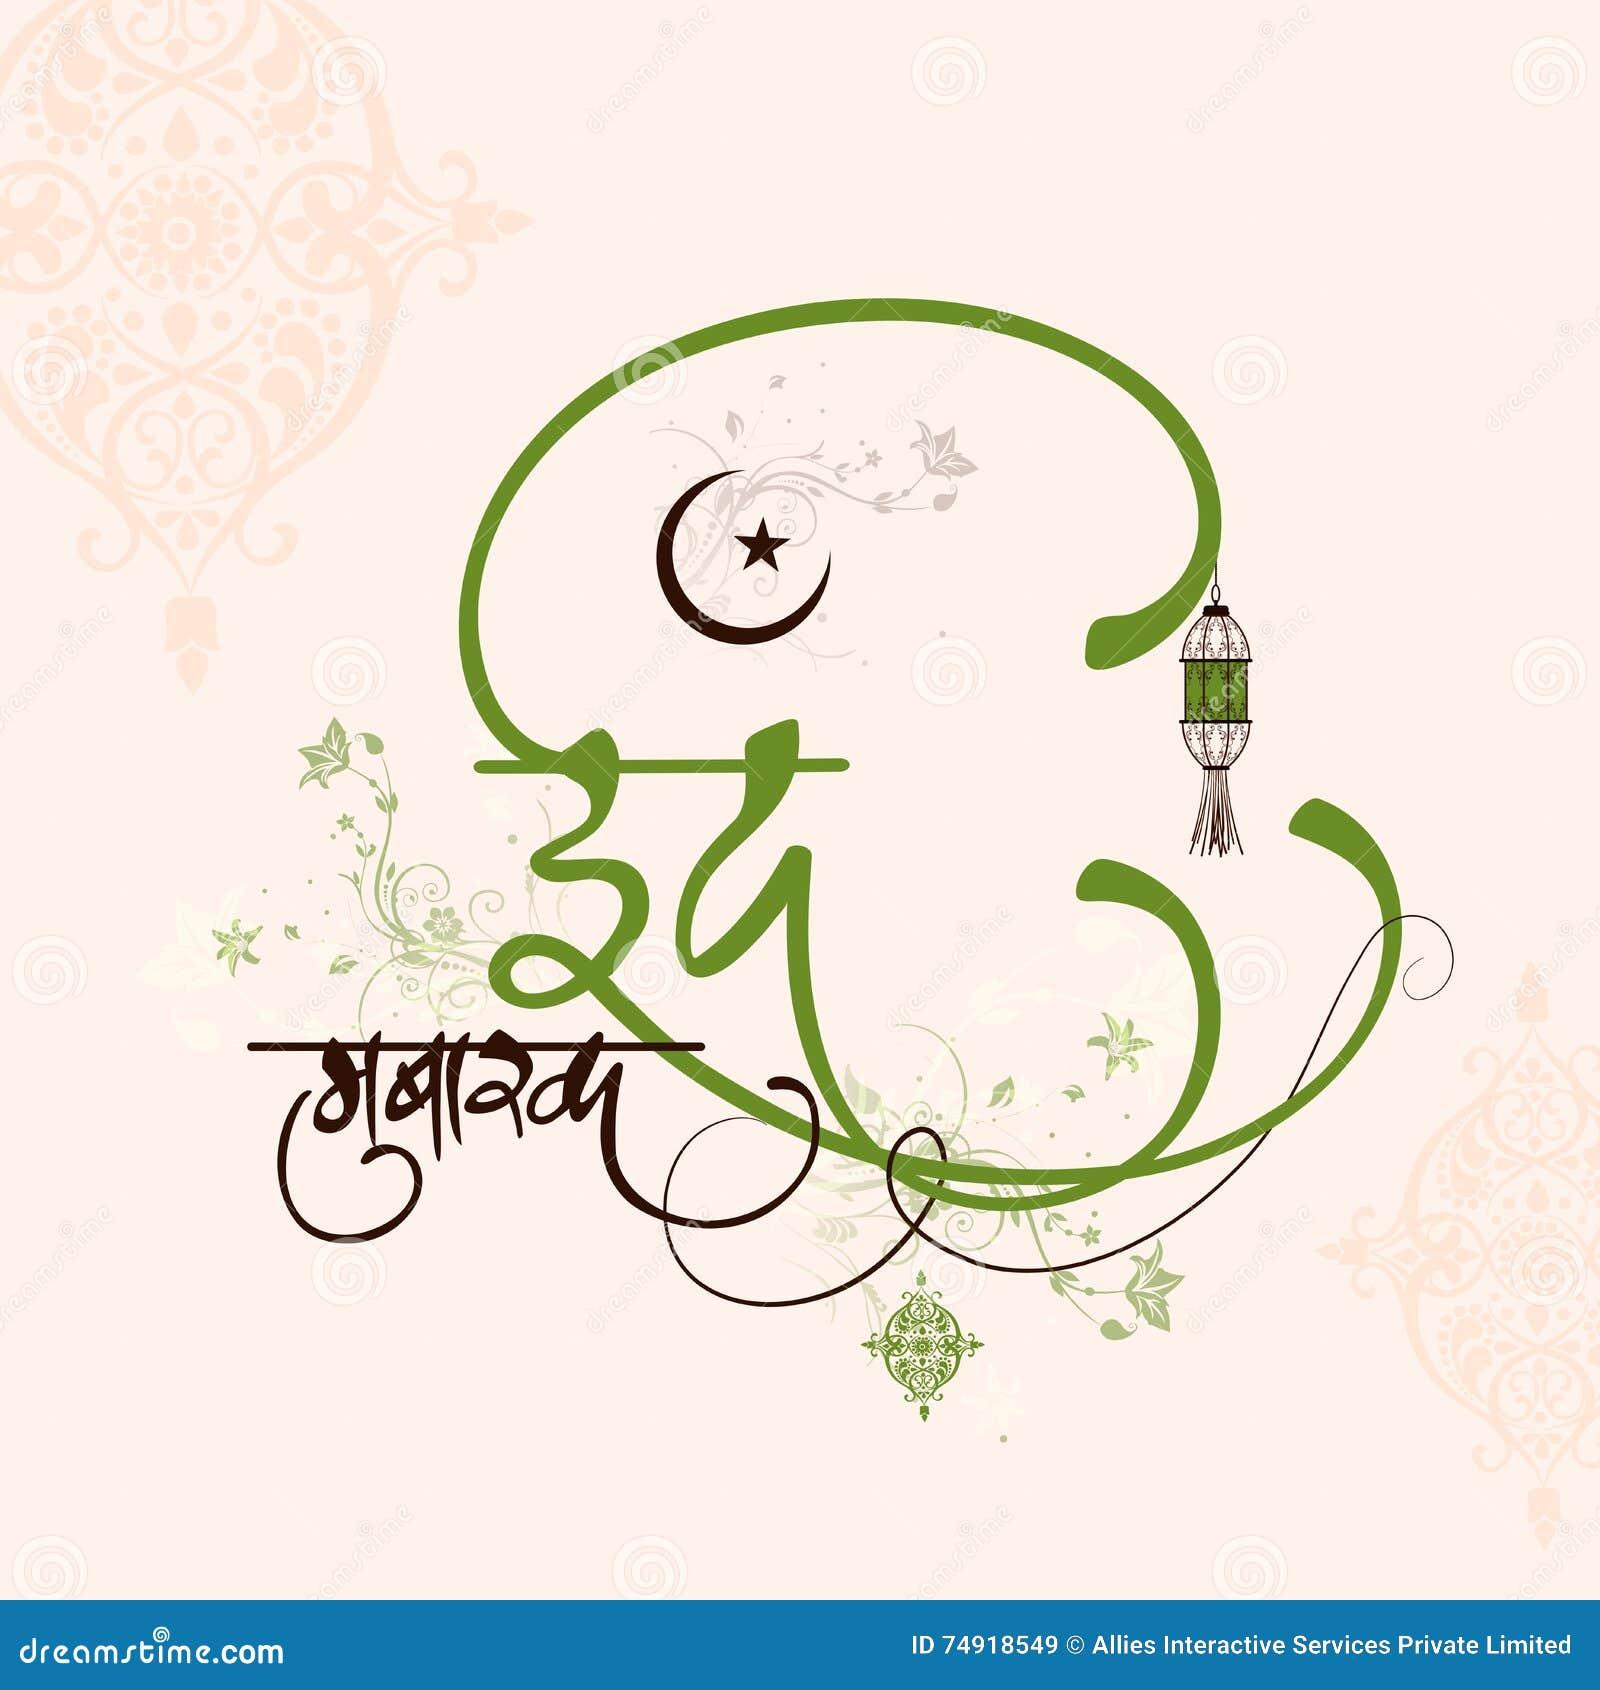 Greeting Card With Hindi Text For Eid Mubarak Illustration 74918549